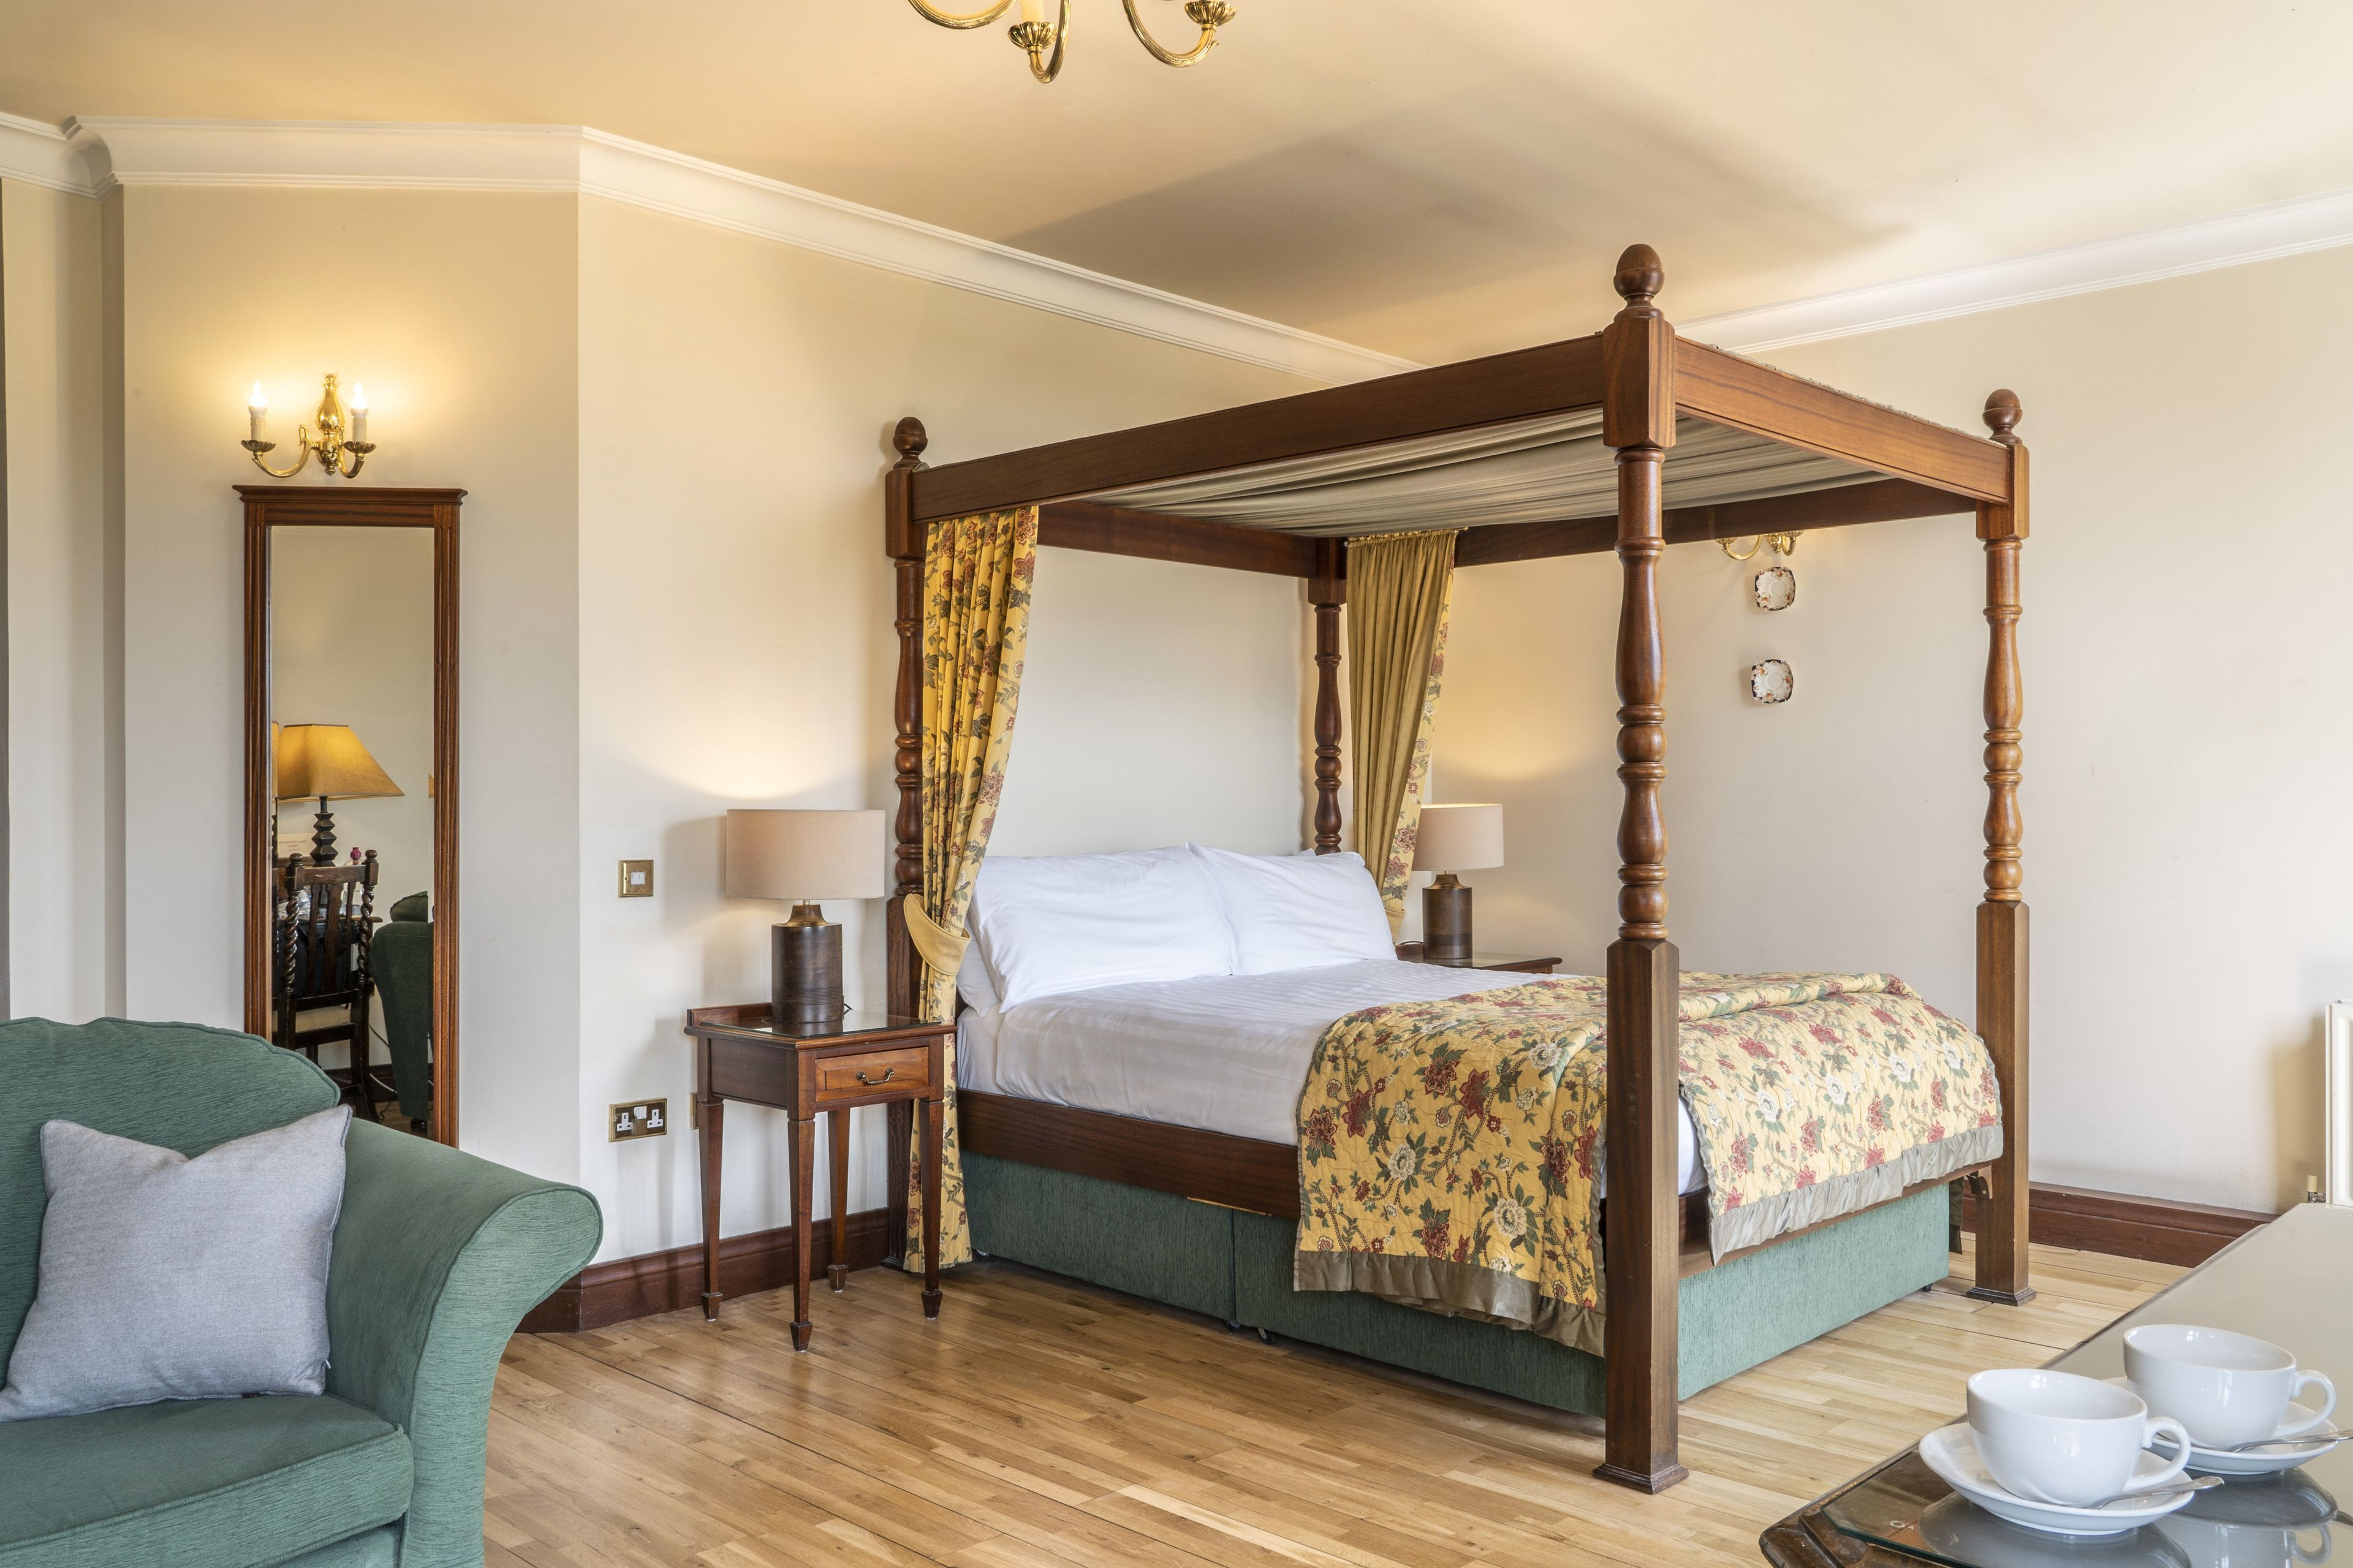 Courtesy of Abbeyglen Castle Hotel / Expedia